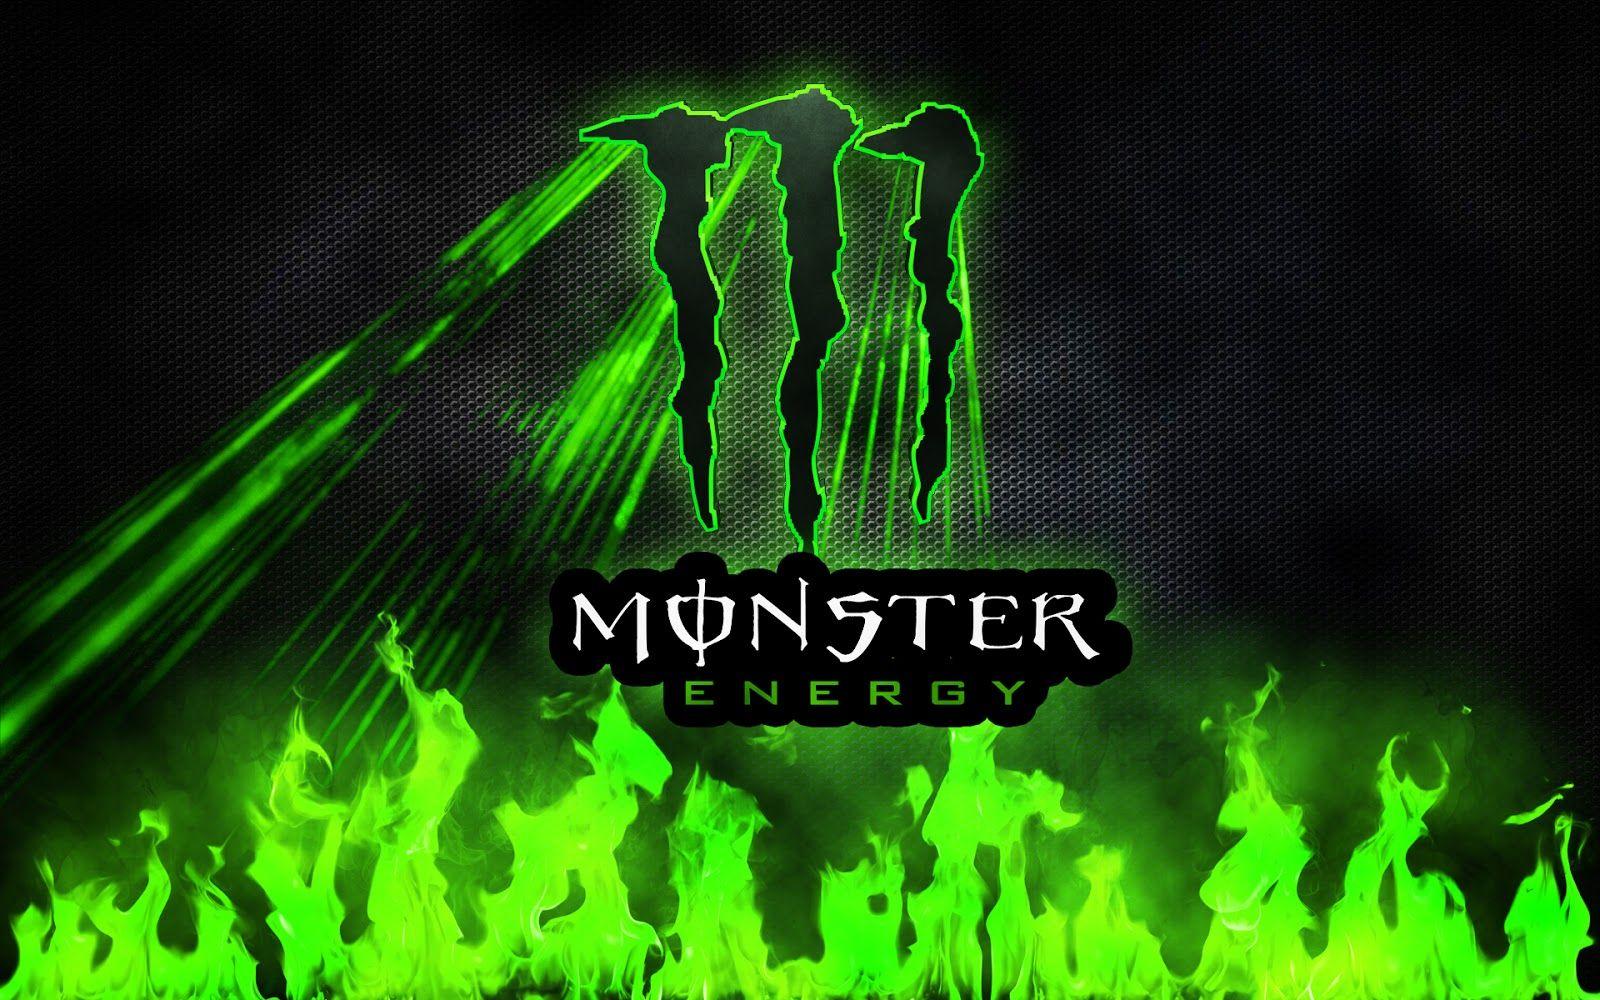 Monster Energy Wallpapers HD   Wallpaper Cave   Images Wallpapers    Pinterest   Wallpaper, Monsters And Hd Wallpaper